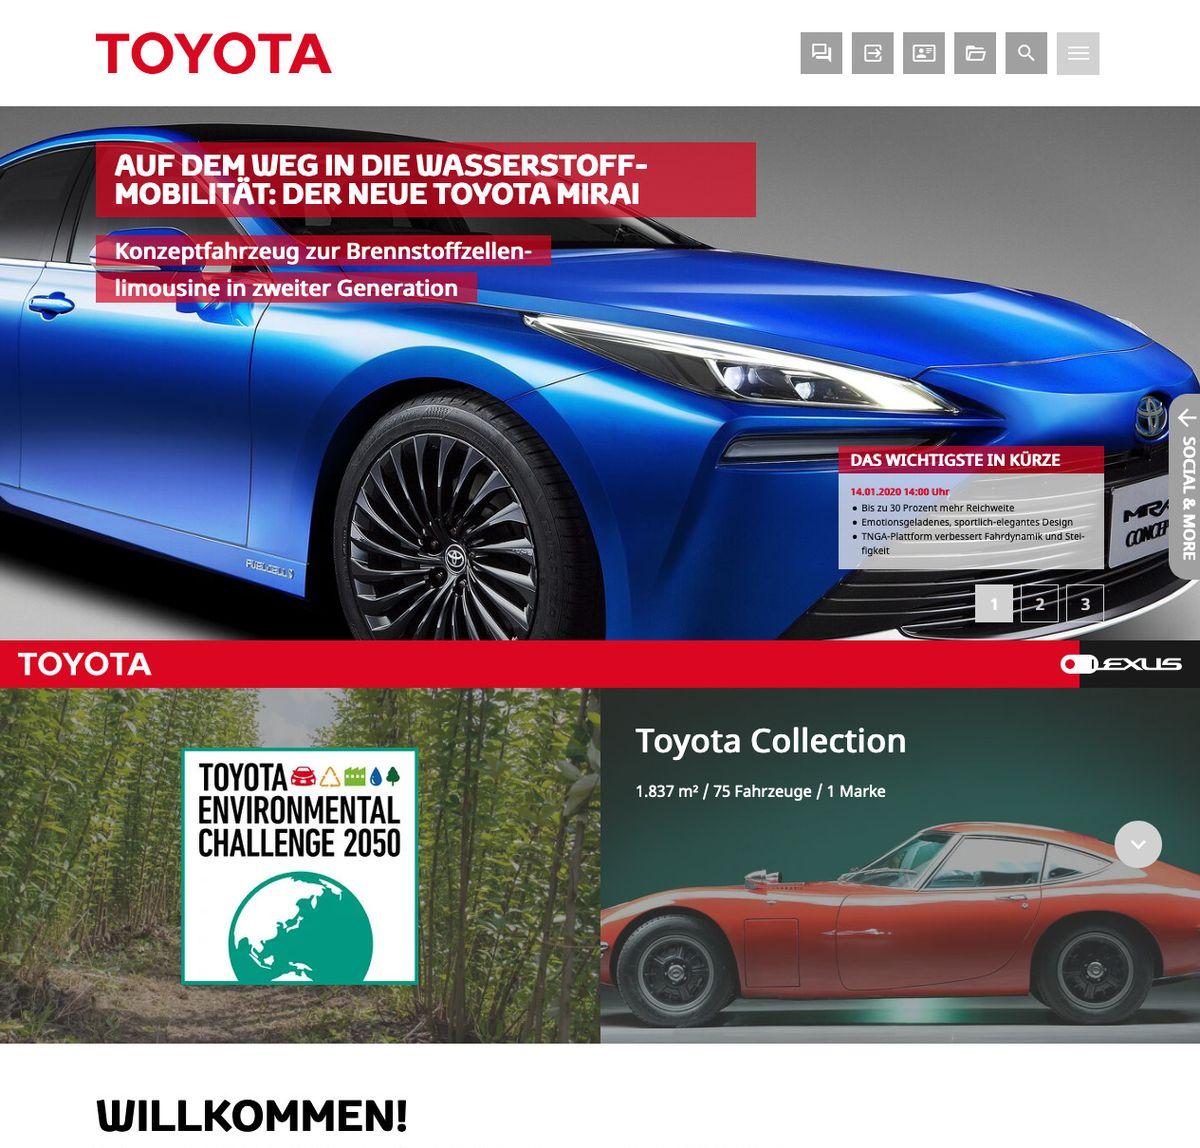 Toyota-Mediaseite: toyota-media.de